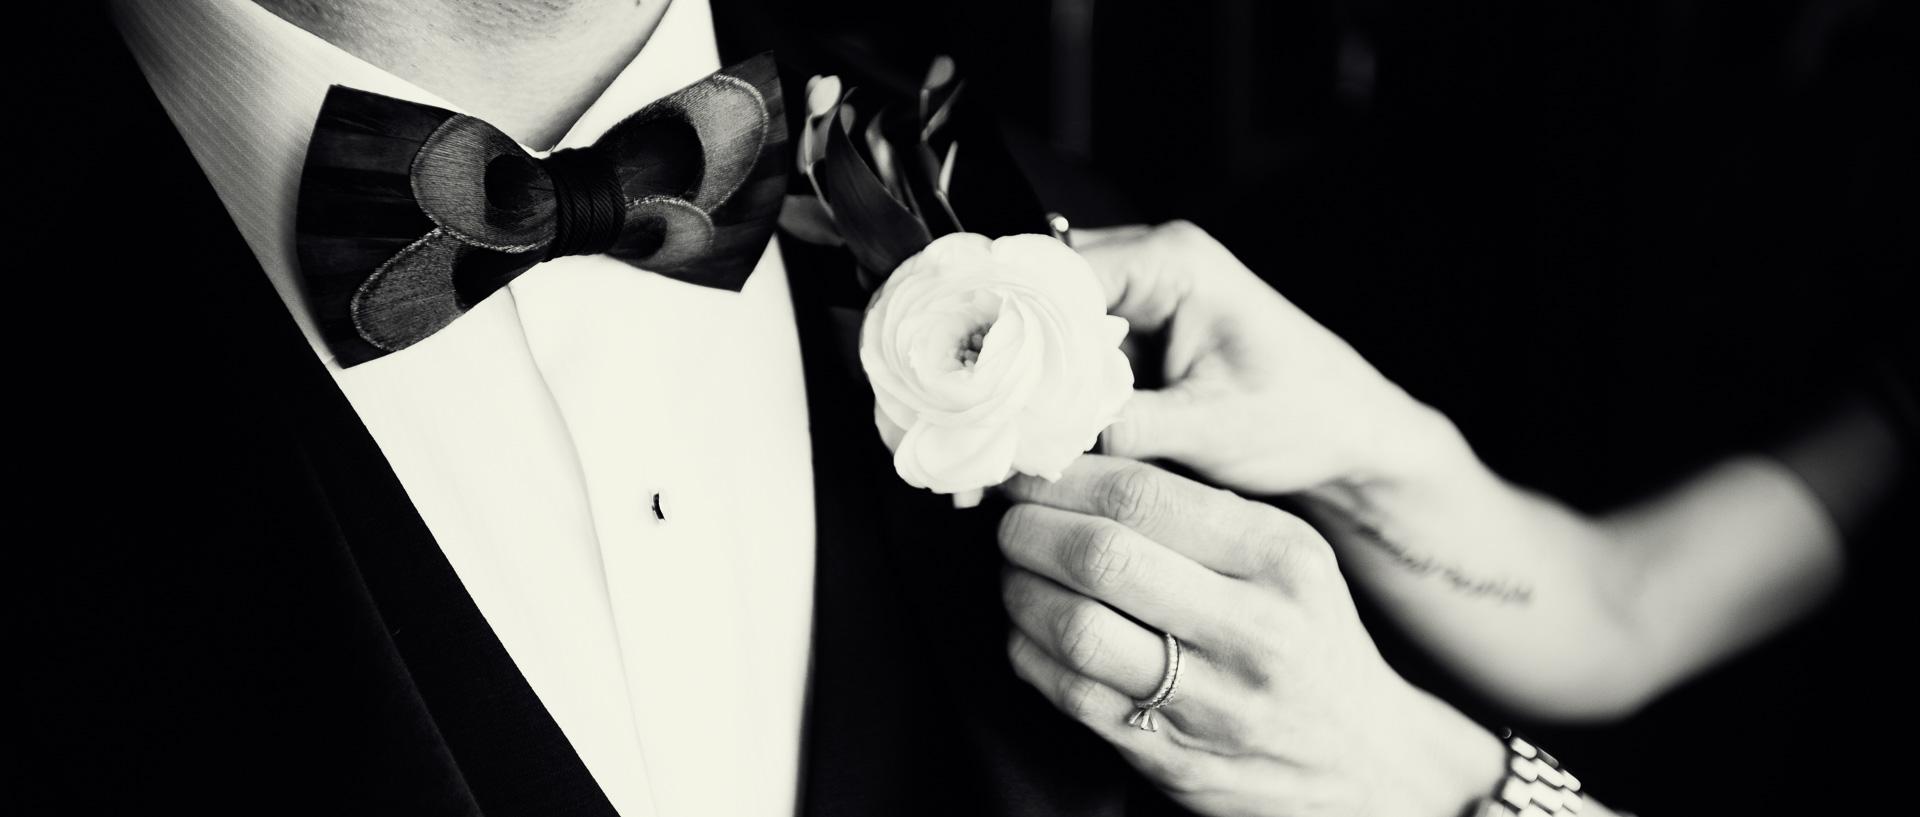 8 - wedding X - B-7010 - wide - _MG_1289.jpg